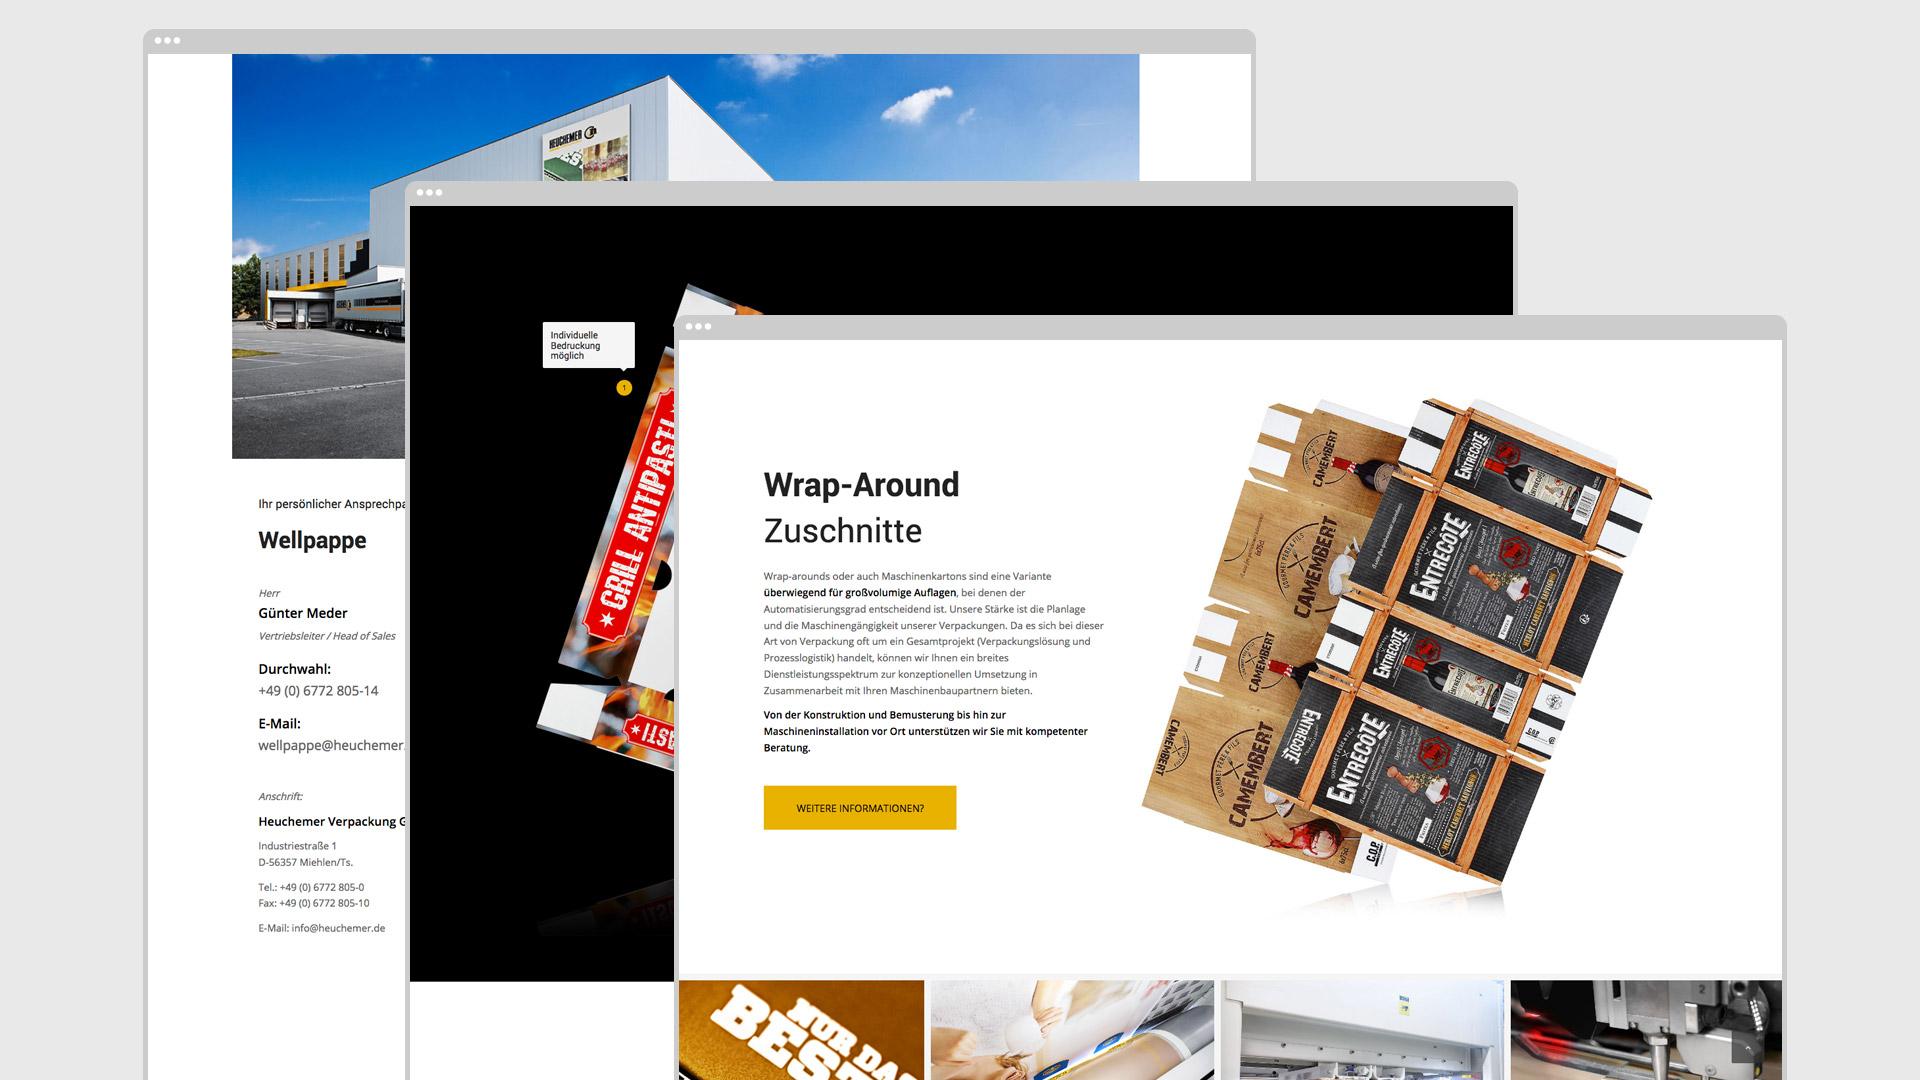 mcks-heuchemer-web-desktop